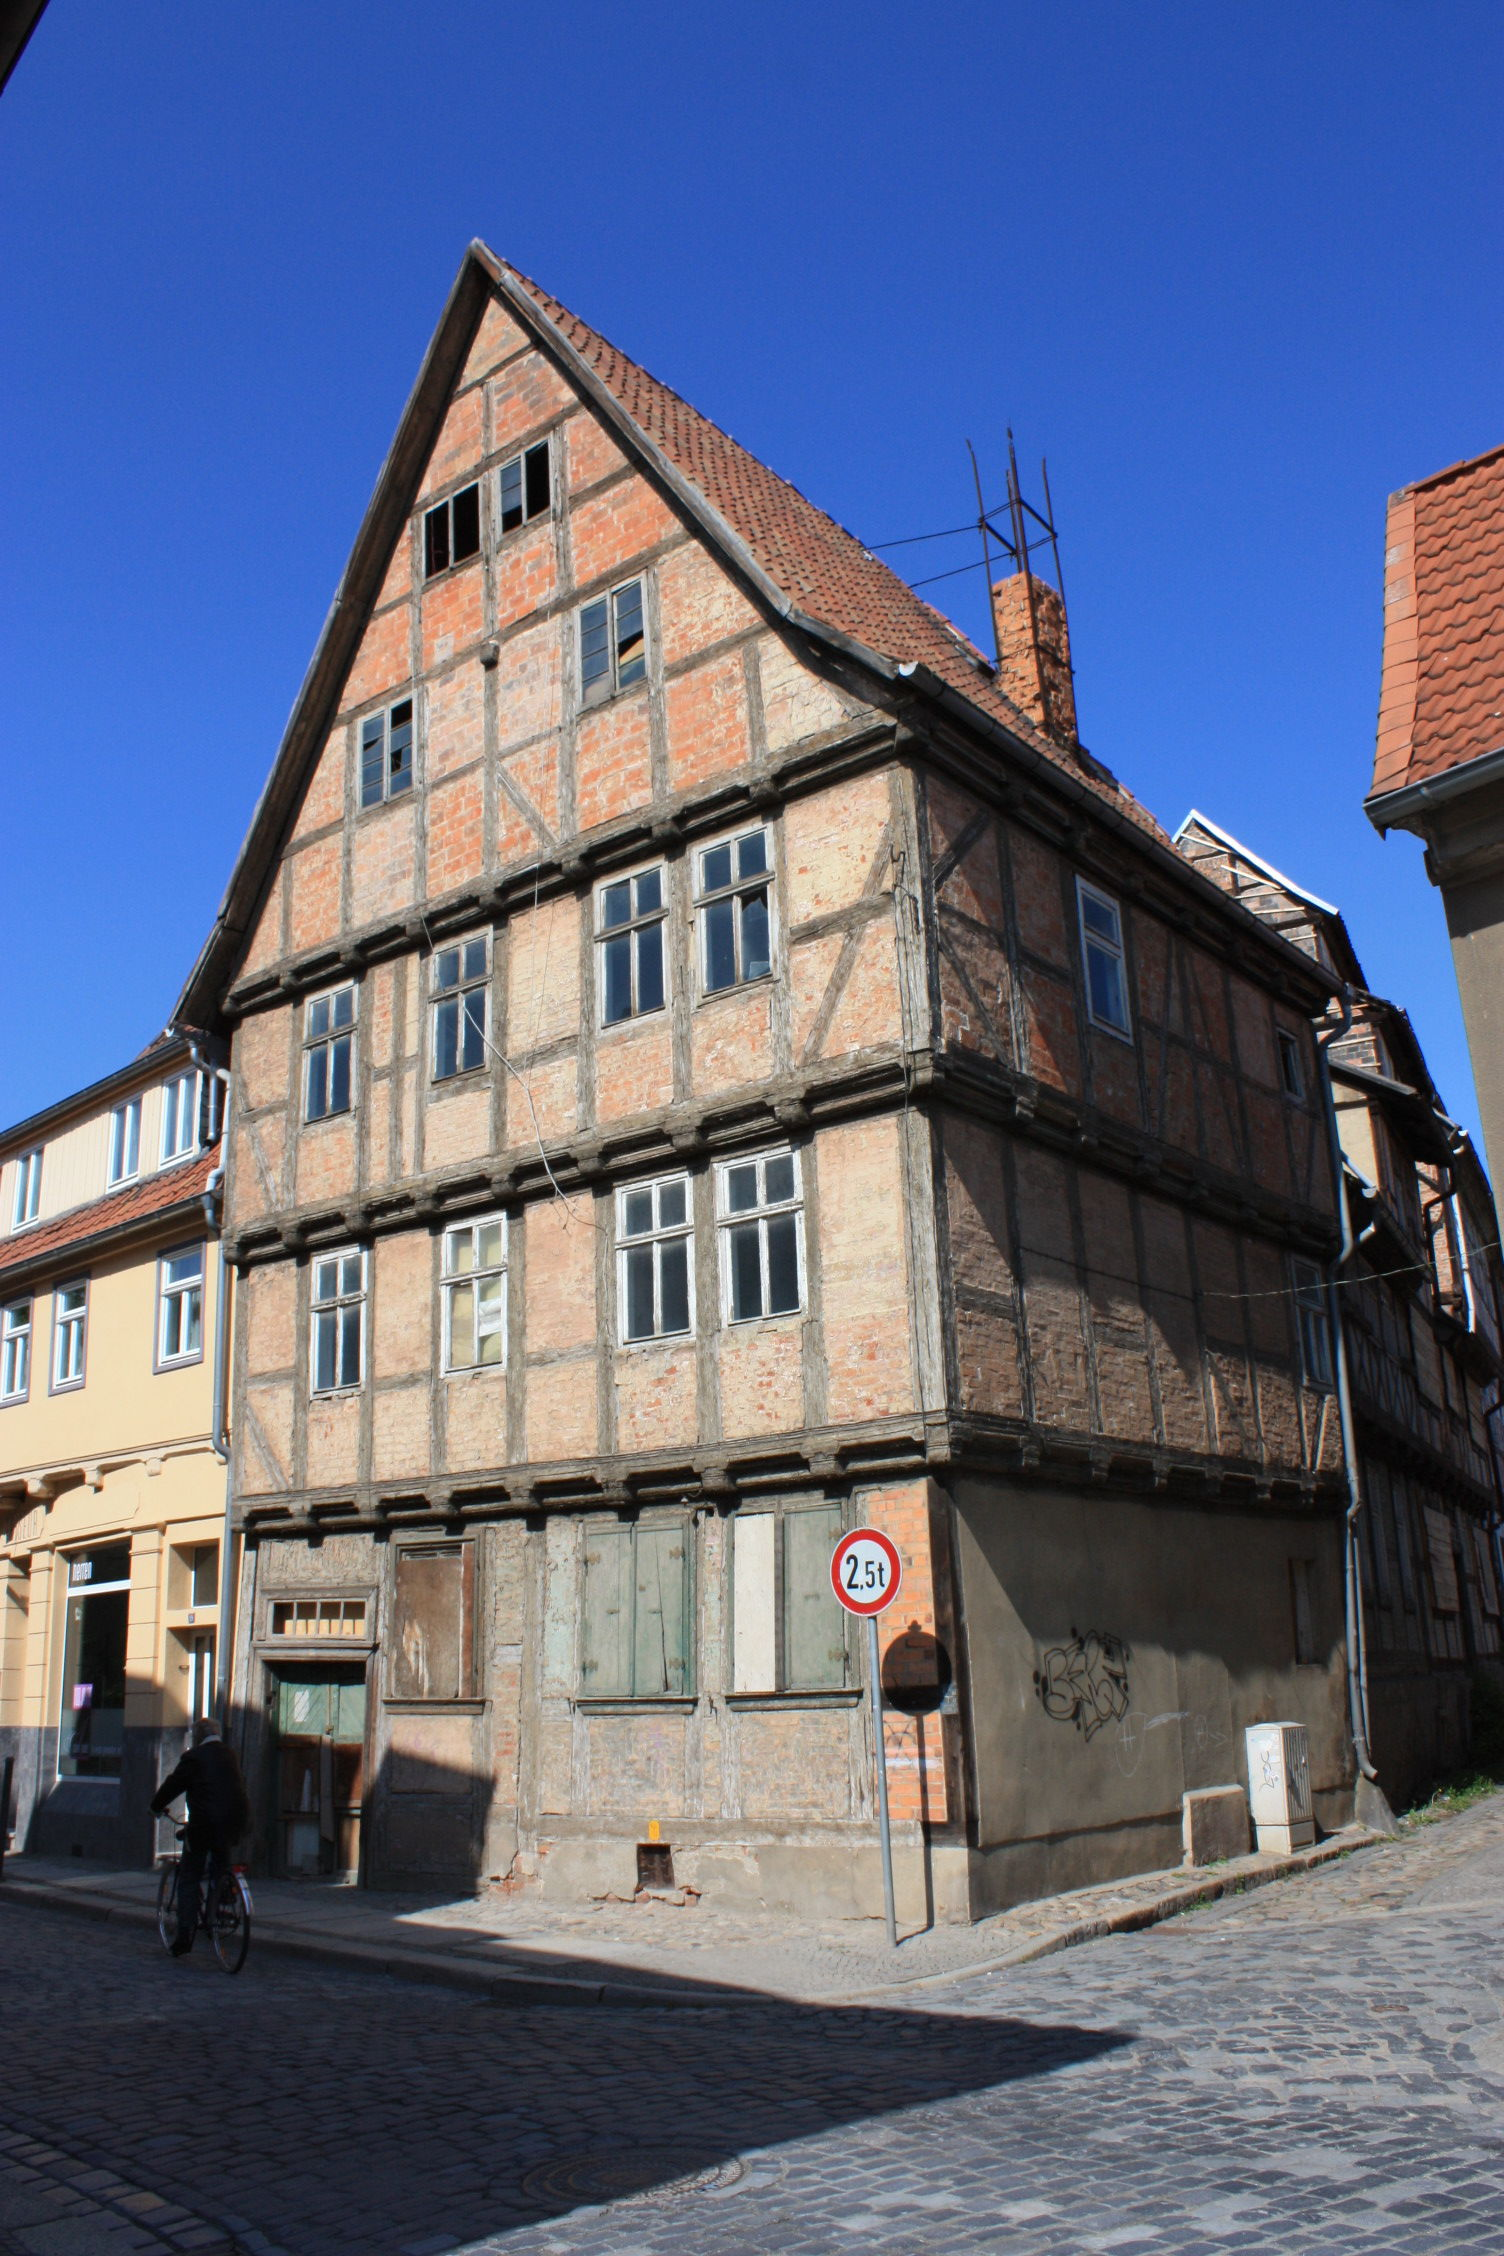 File:Schmale Straße 20 (Quedlinburg 2012) by Andreas Werner - IMG ...